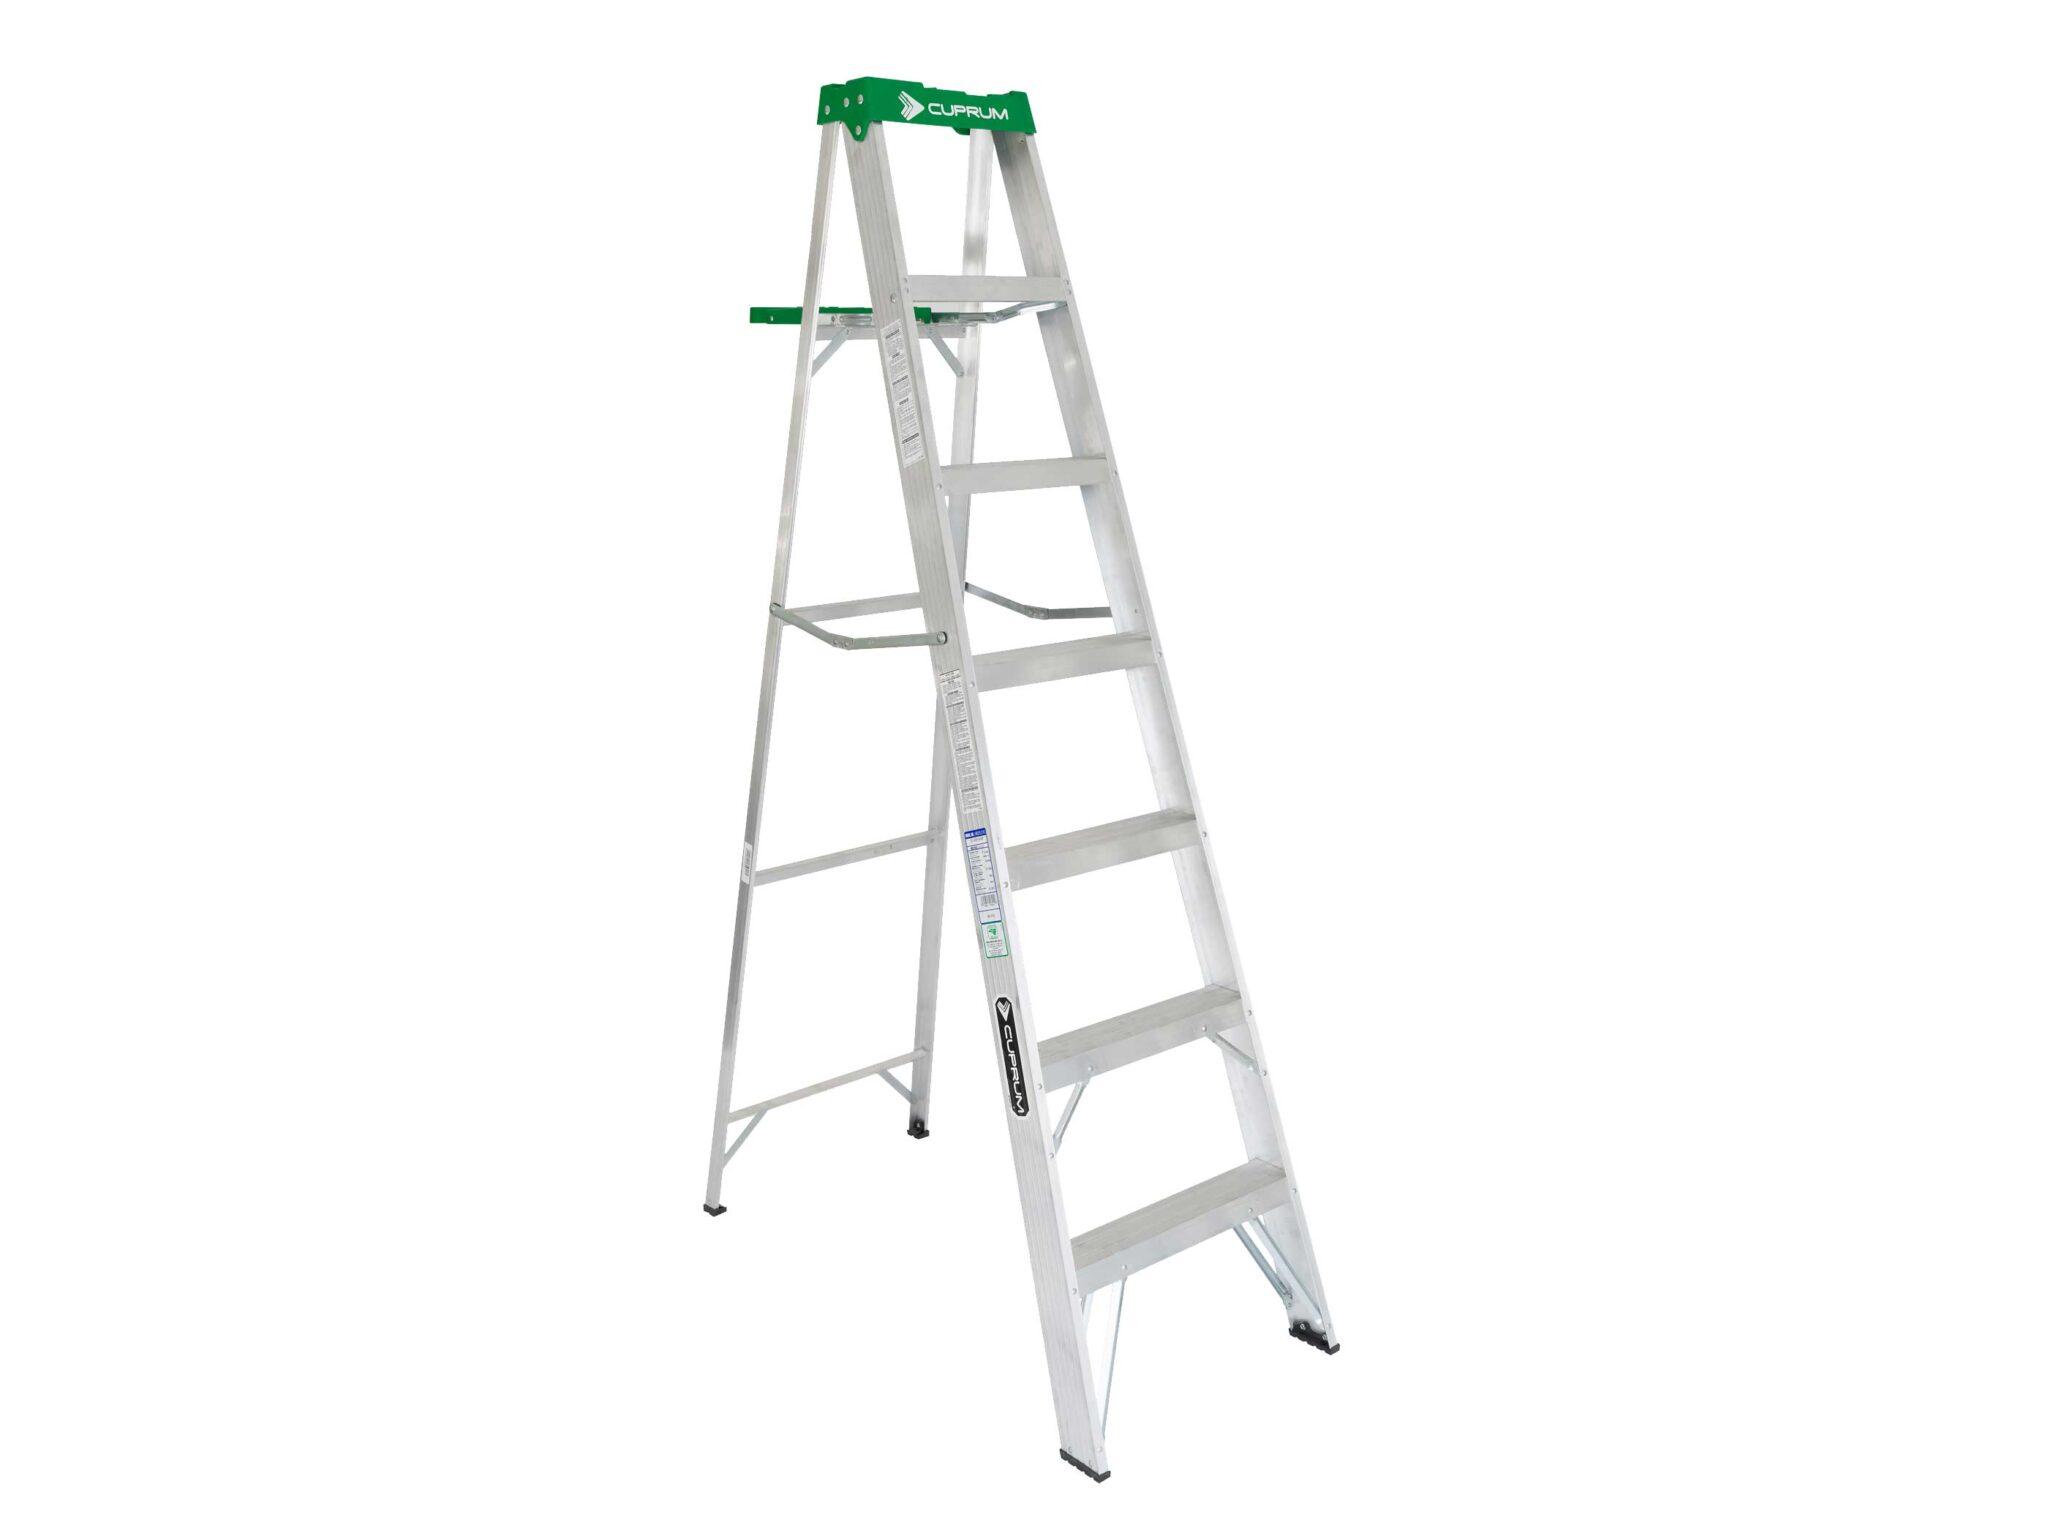 Escalera de tijera de aluminio 6 pelda os cuprum for Escaleras cuprum